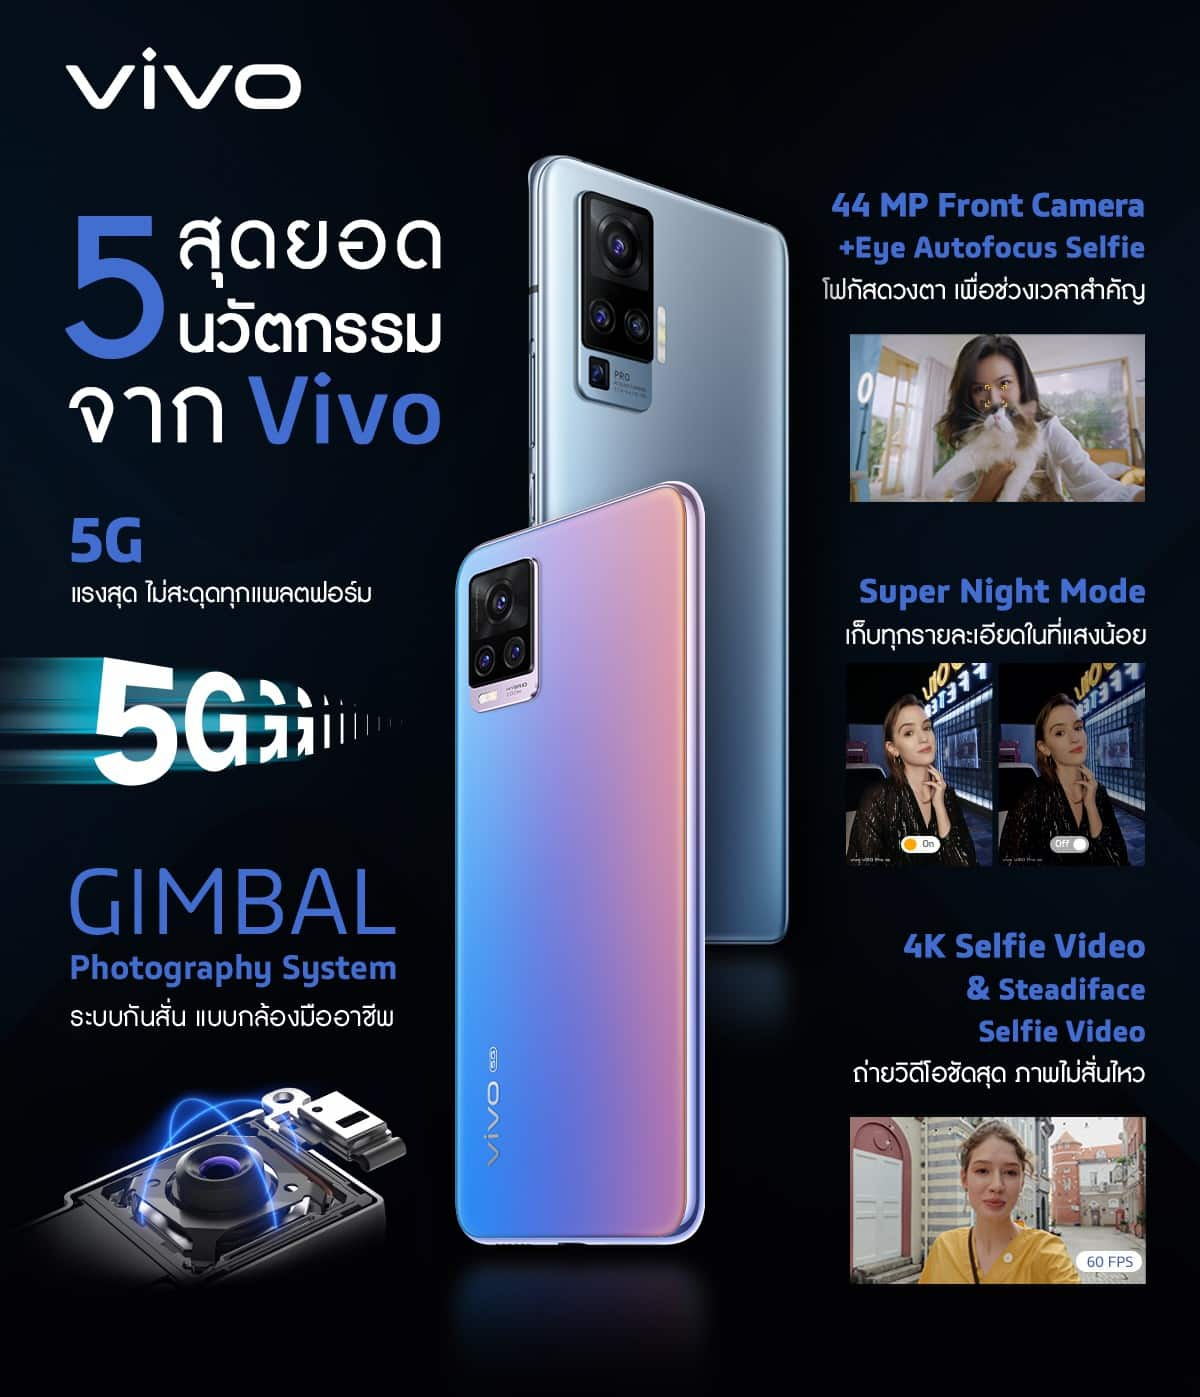 Vivo 5 innovations FINAL - 5 สุดยอดนวัตกรรมที่ Vivo มอบแก่ผู้บริโภคชาวไทยปีนี้